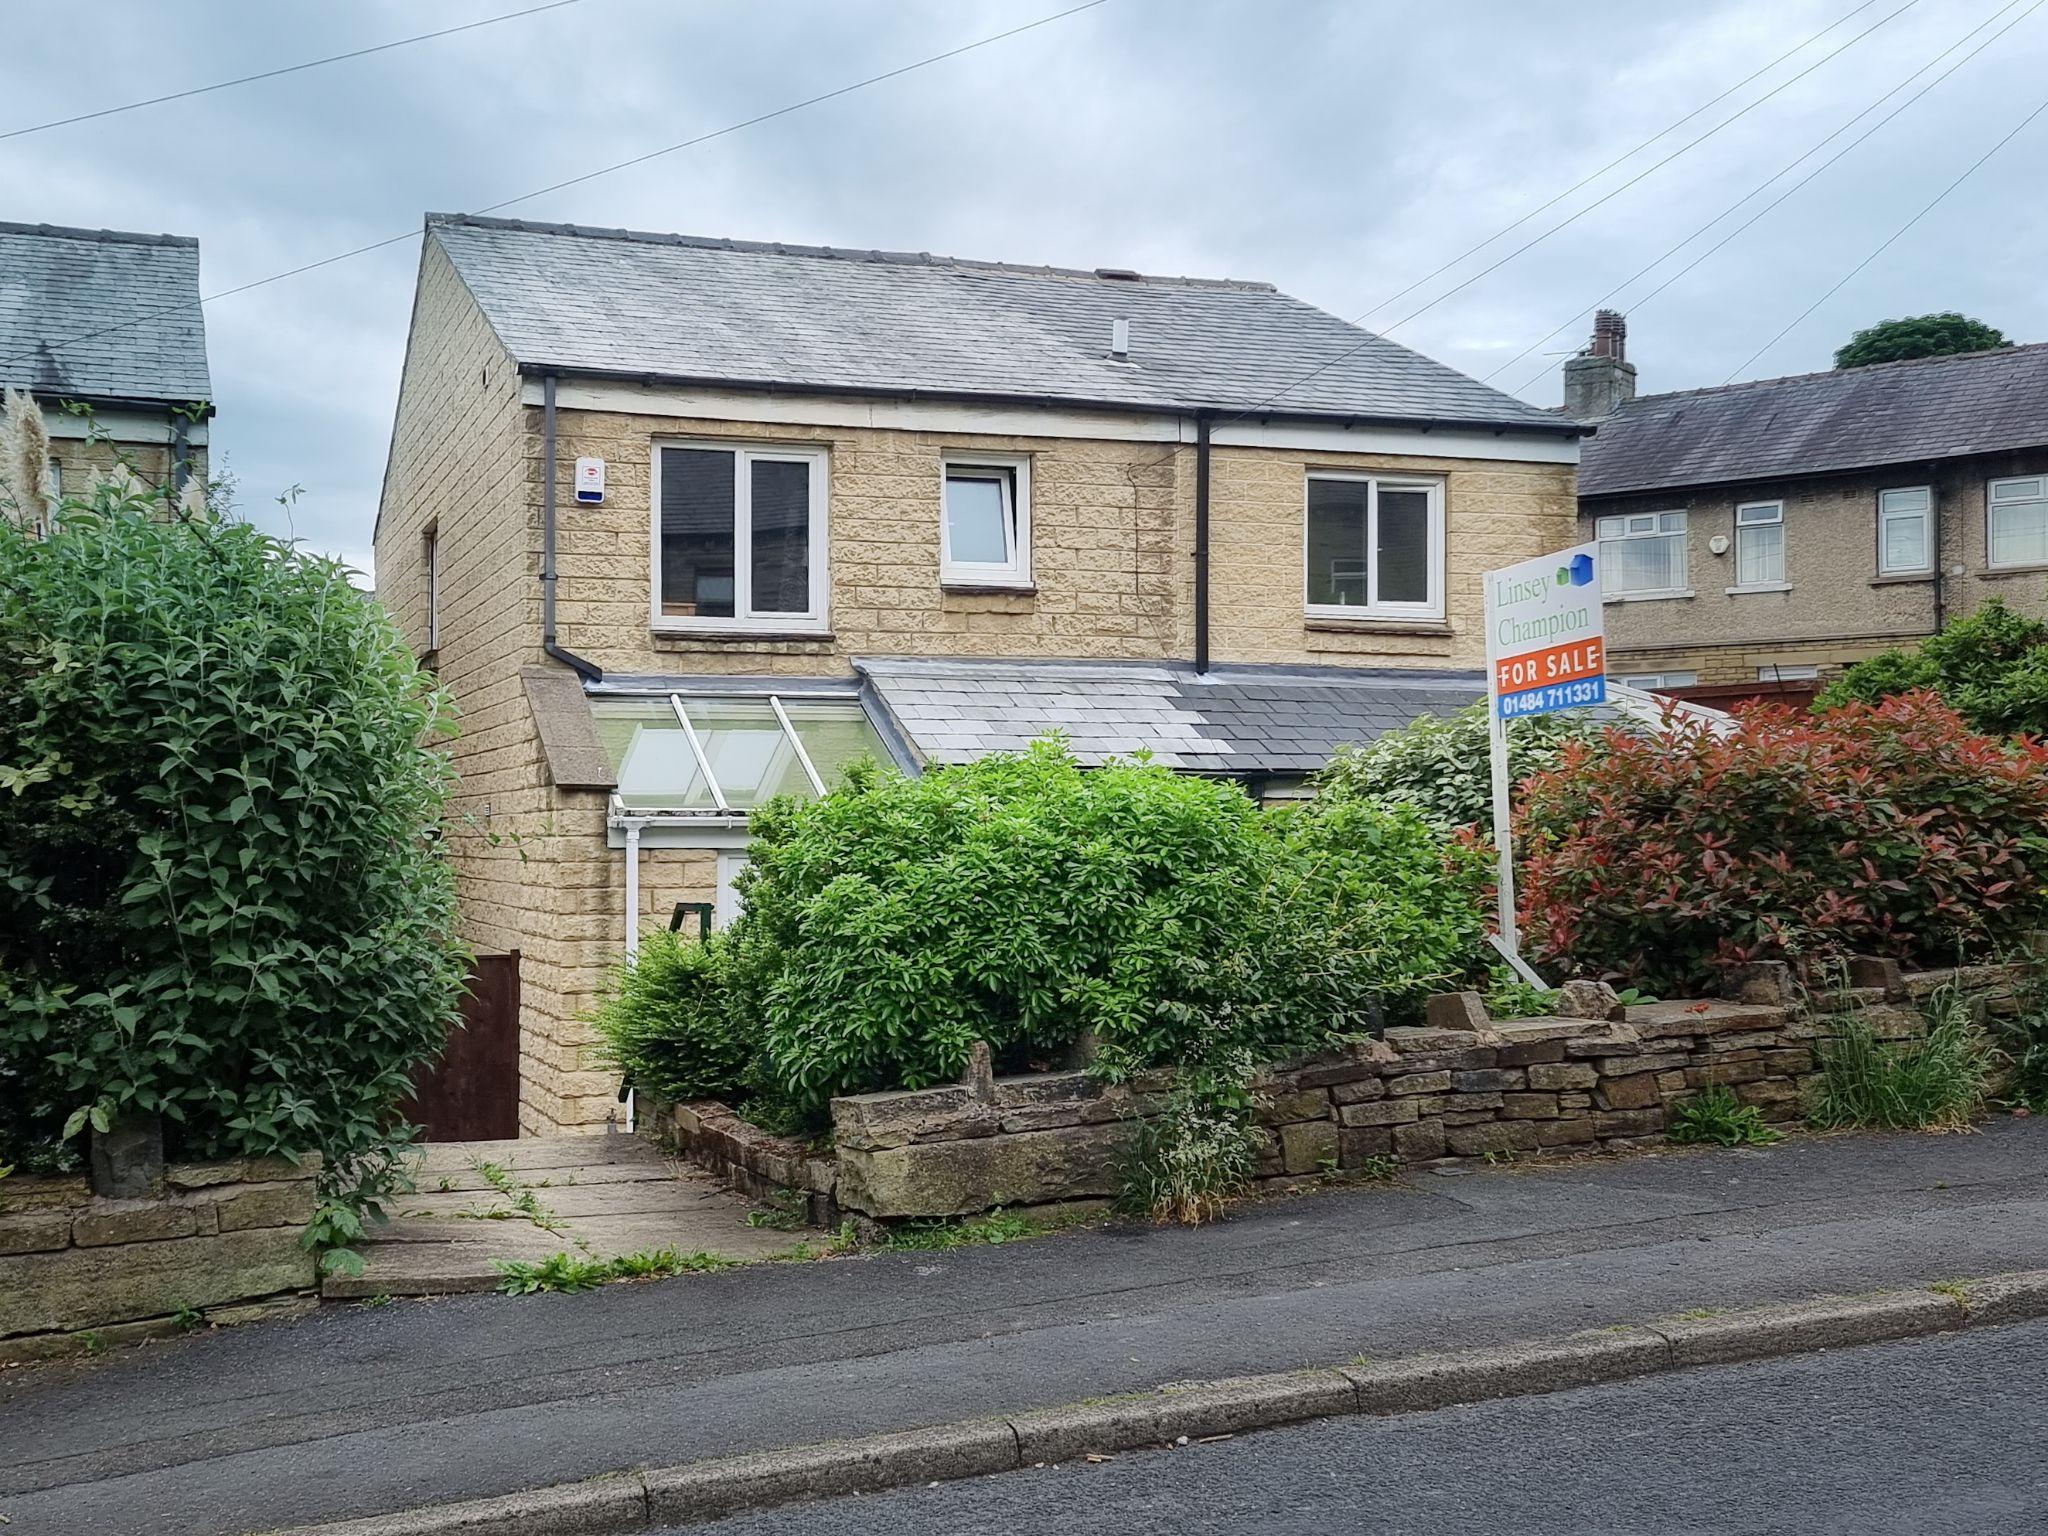 4 Bedroom Detached House For Sale - Exterior